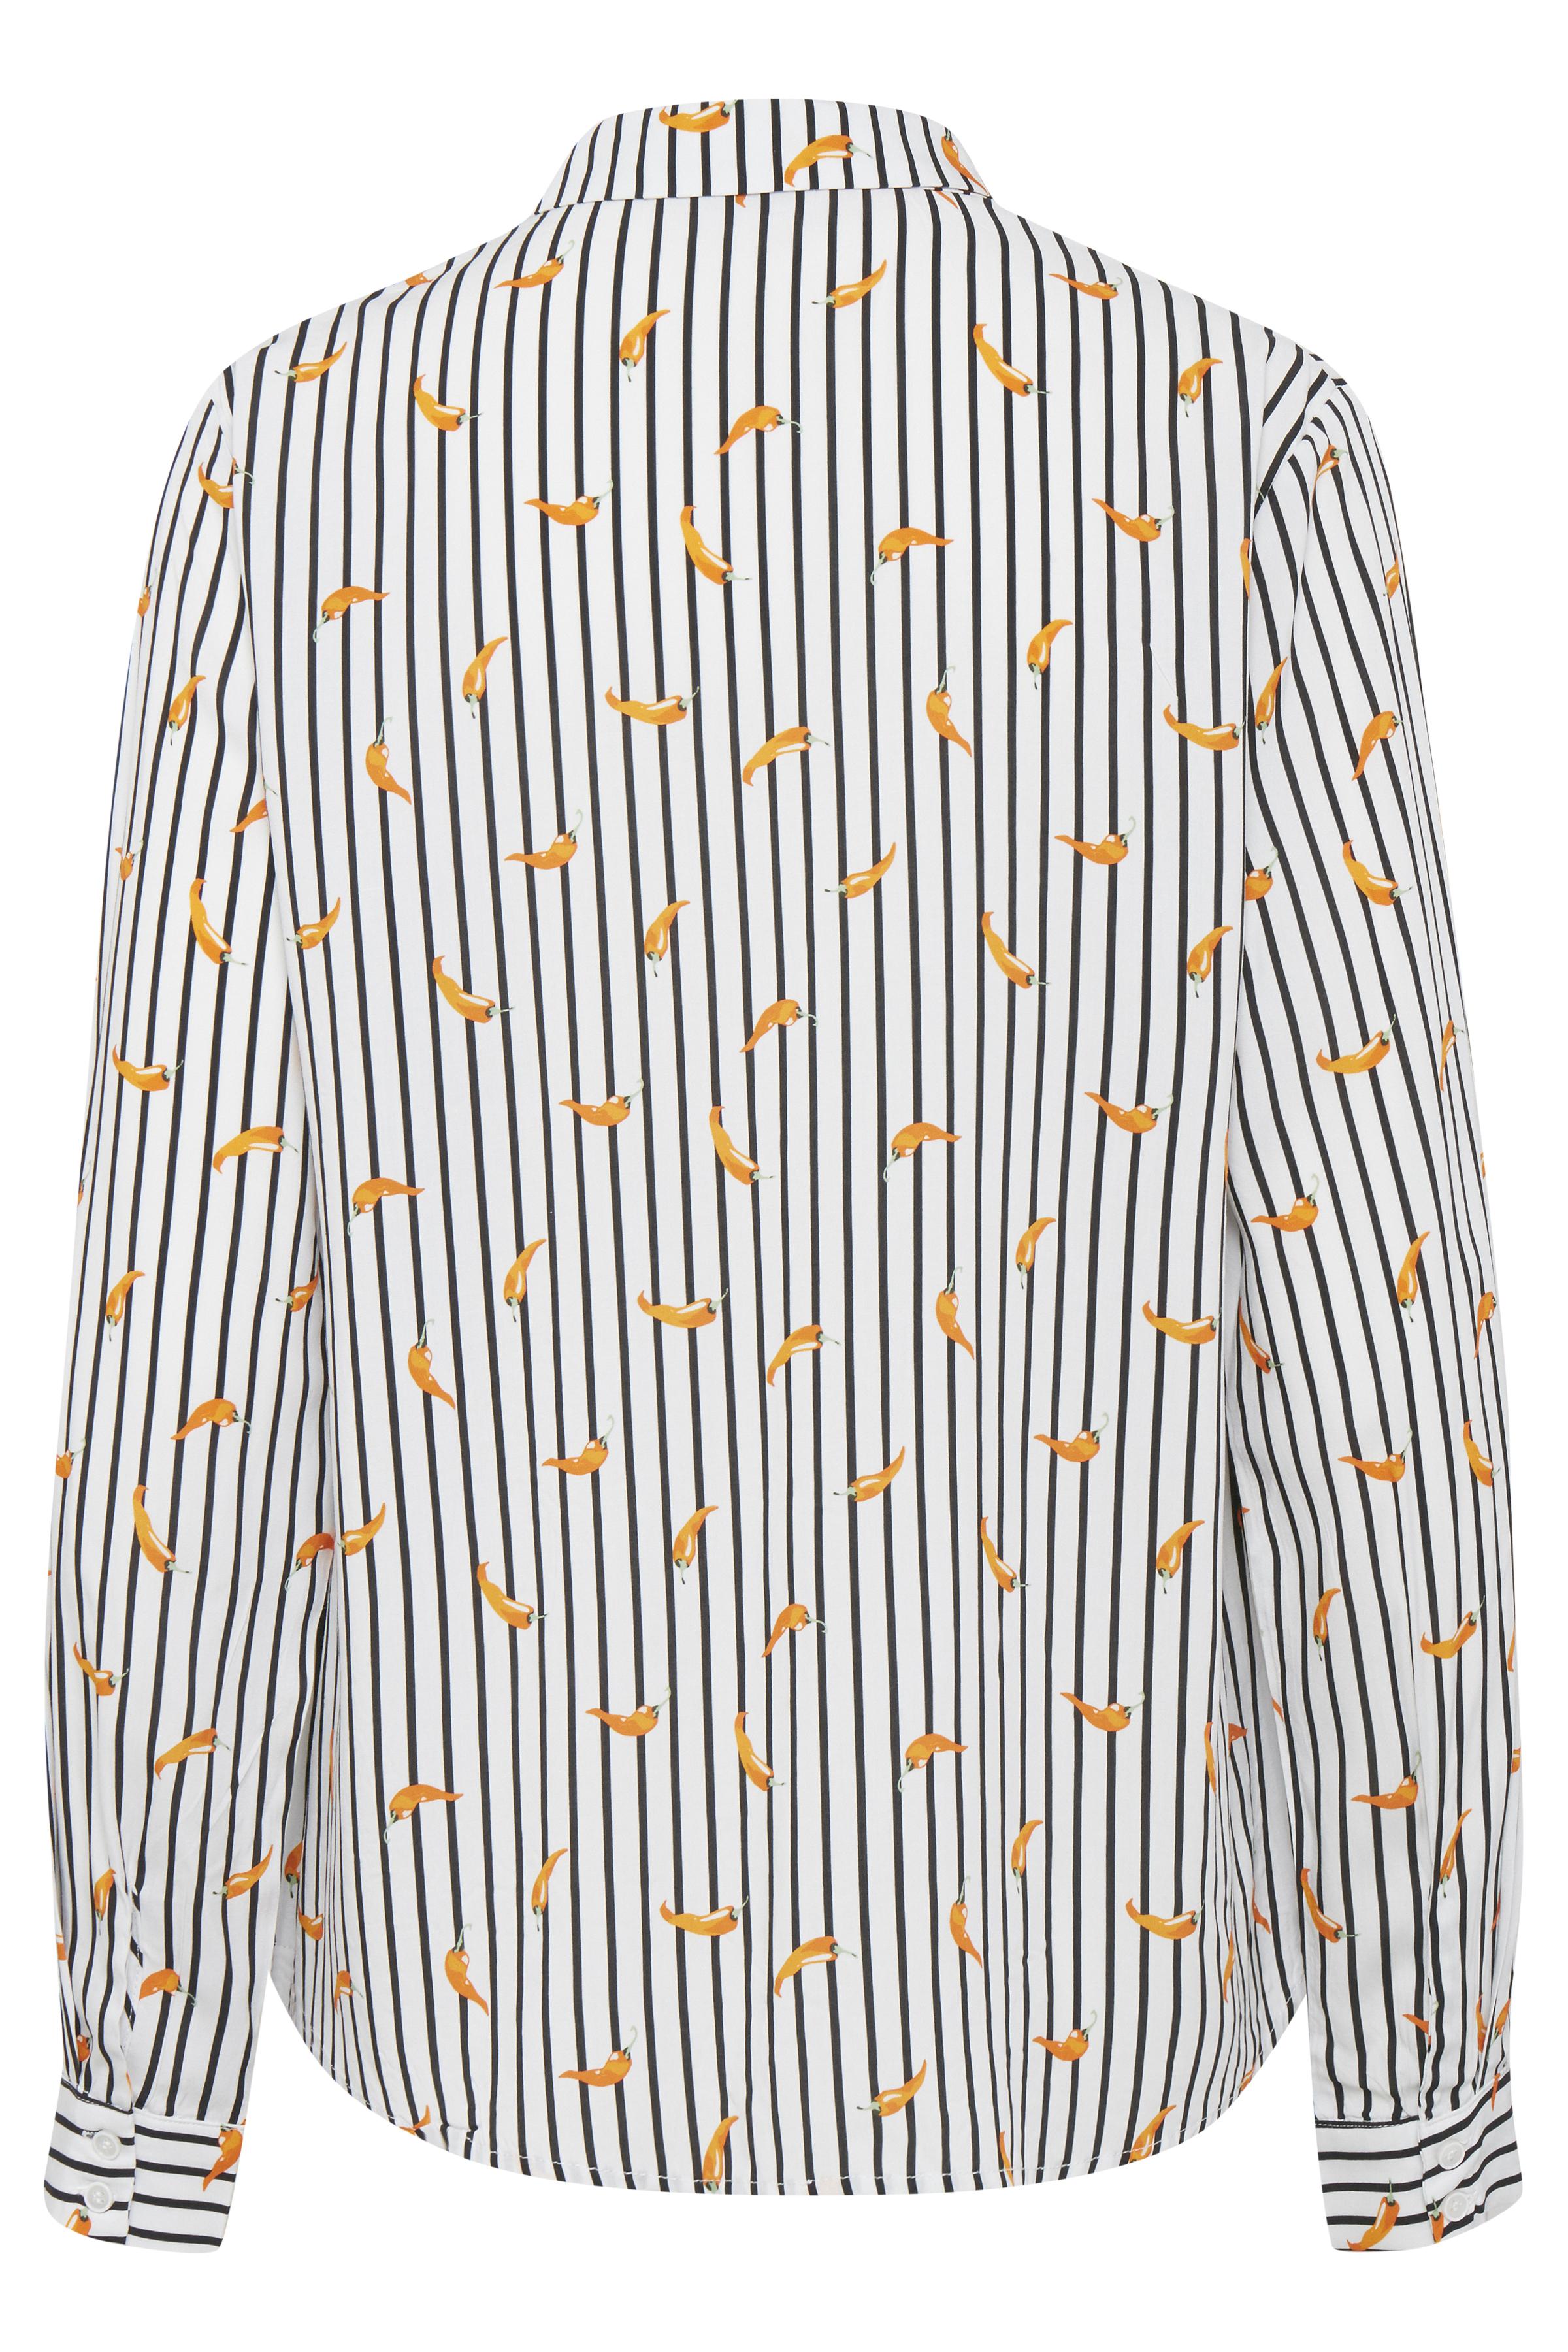 Off white combi 1 Langærmet skjorte fra b.young – Køb Off white combi 1 Langærmet skjorte fra str. 34-46 her